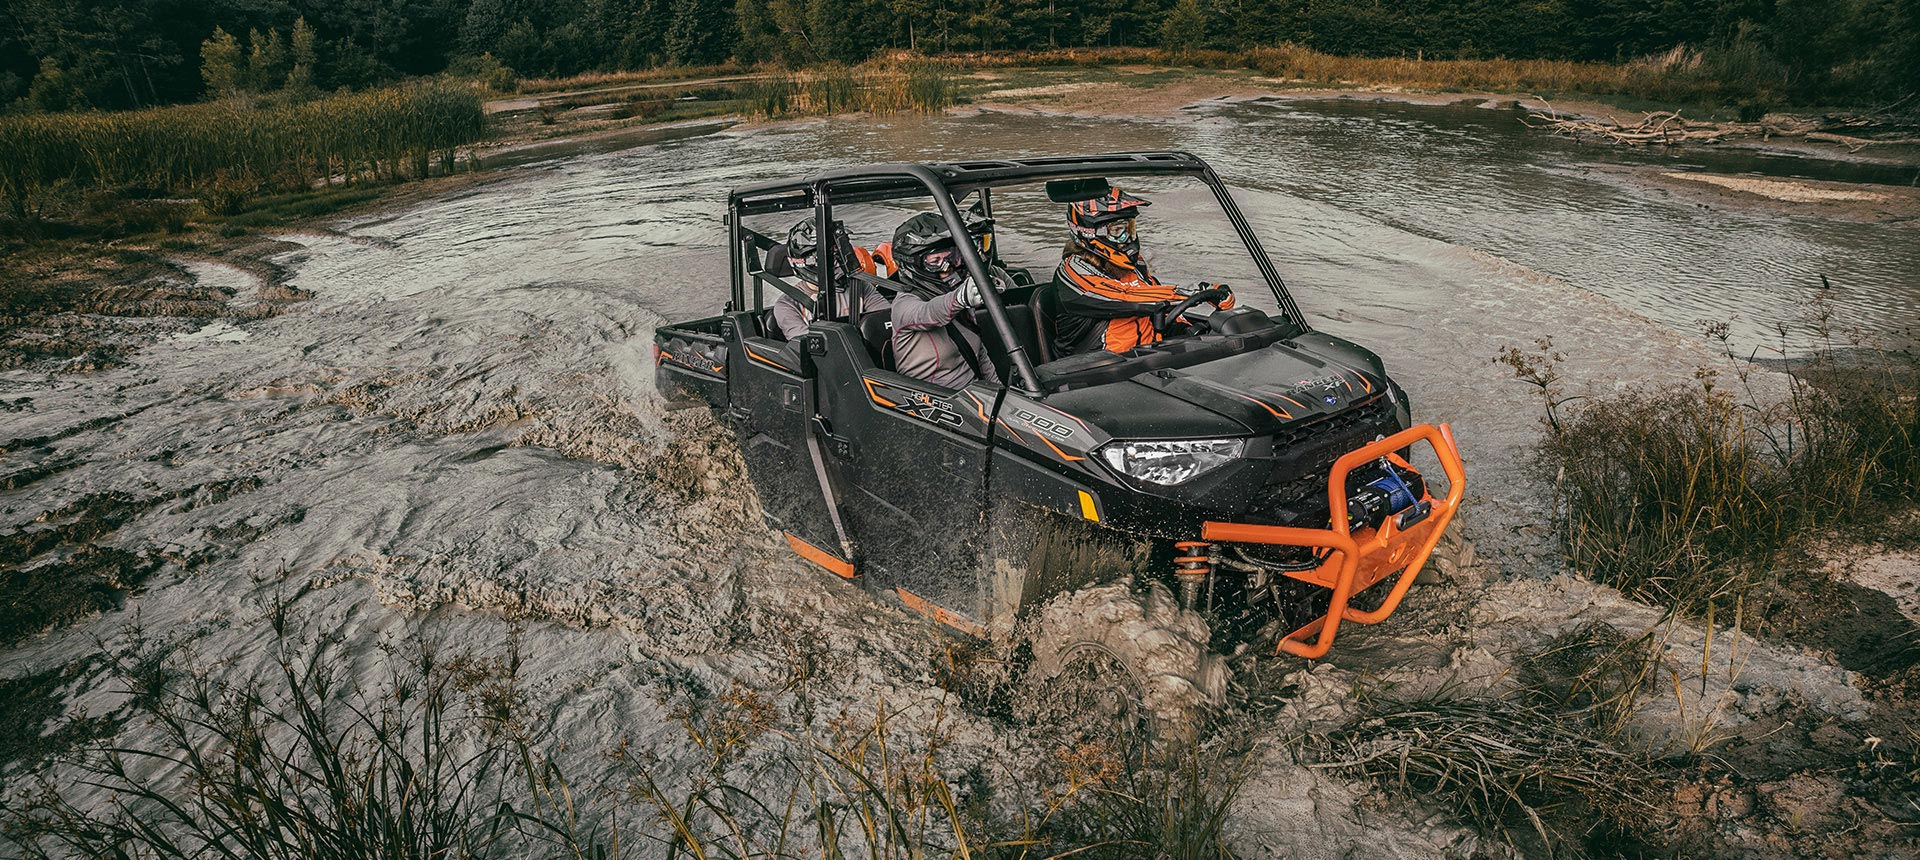 ranger-crew-xp-100-highlifter-media-6